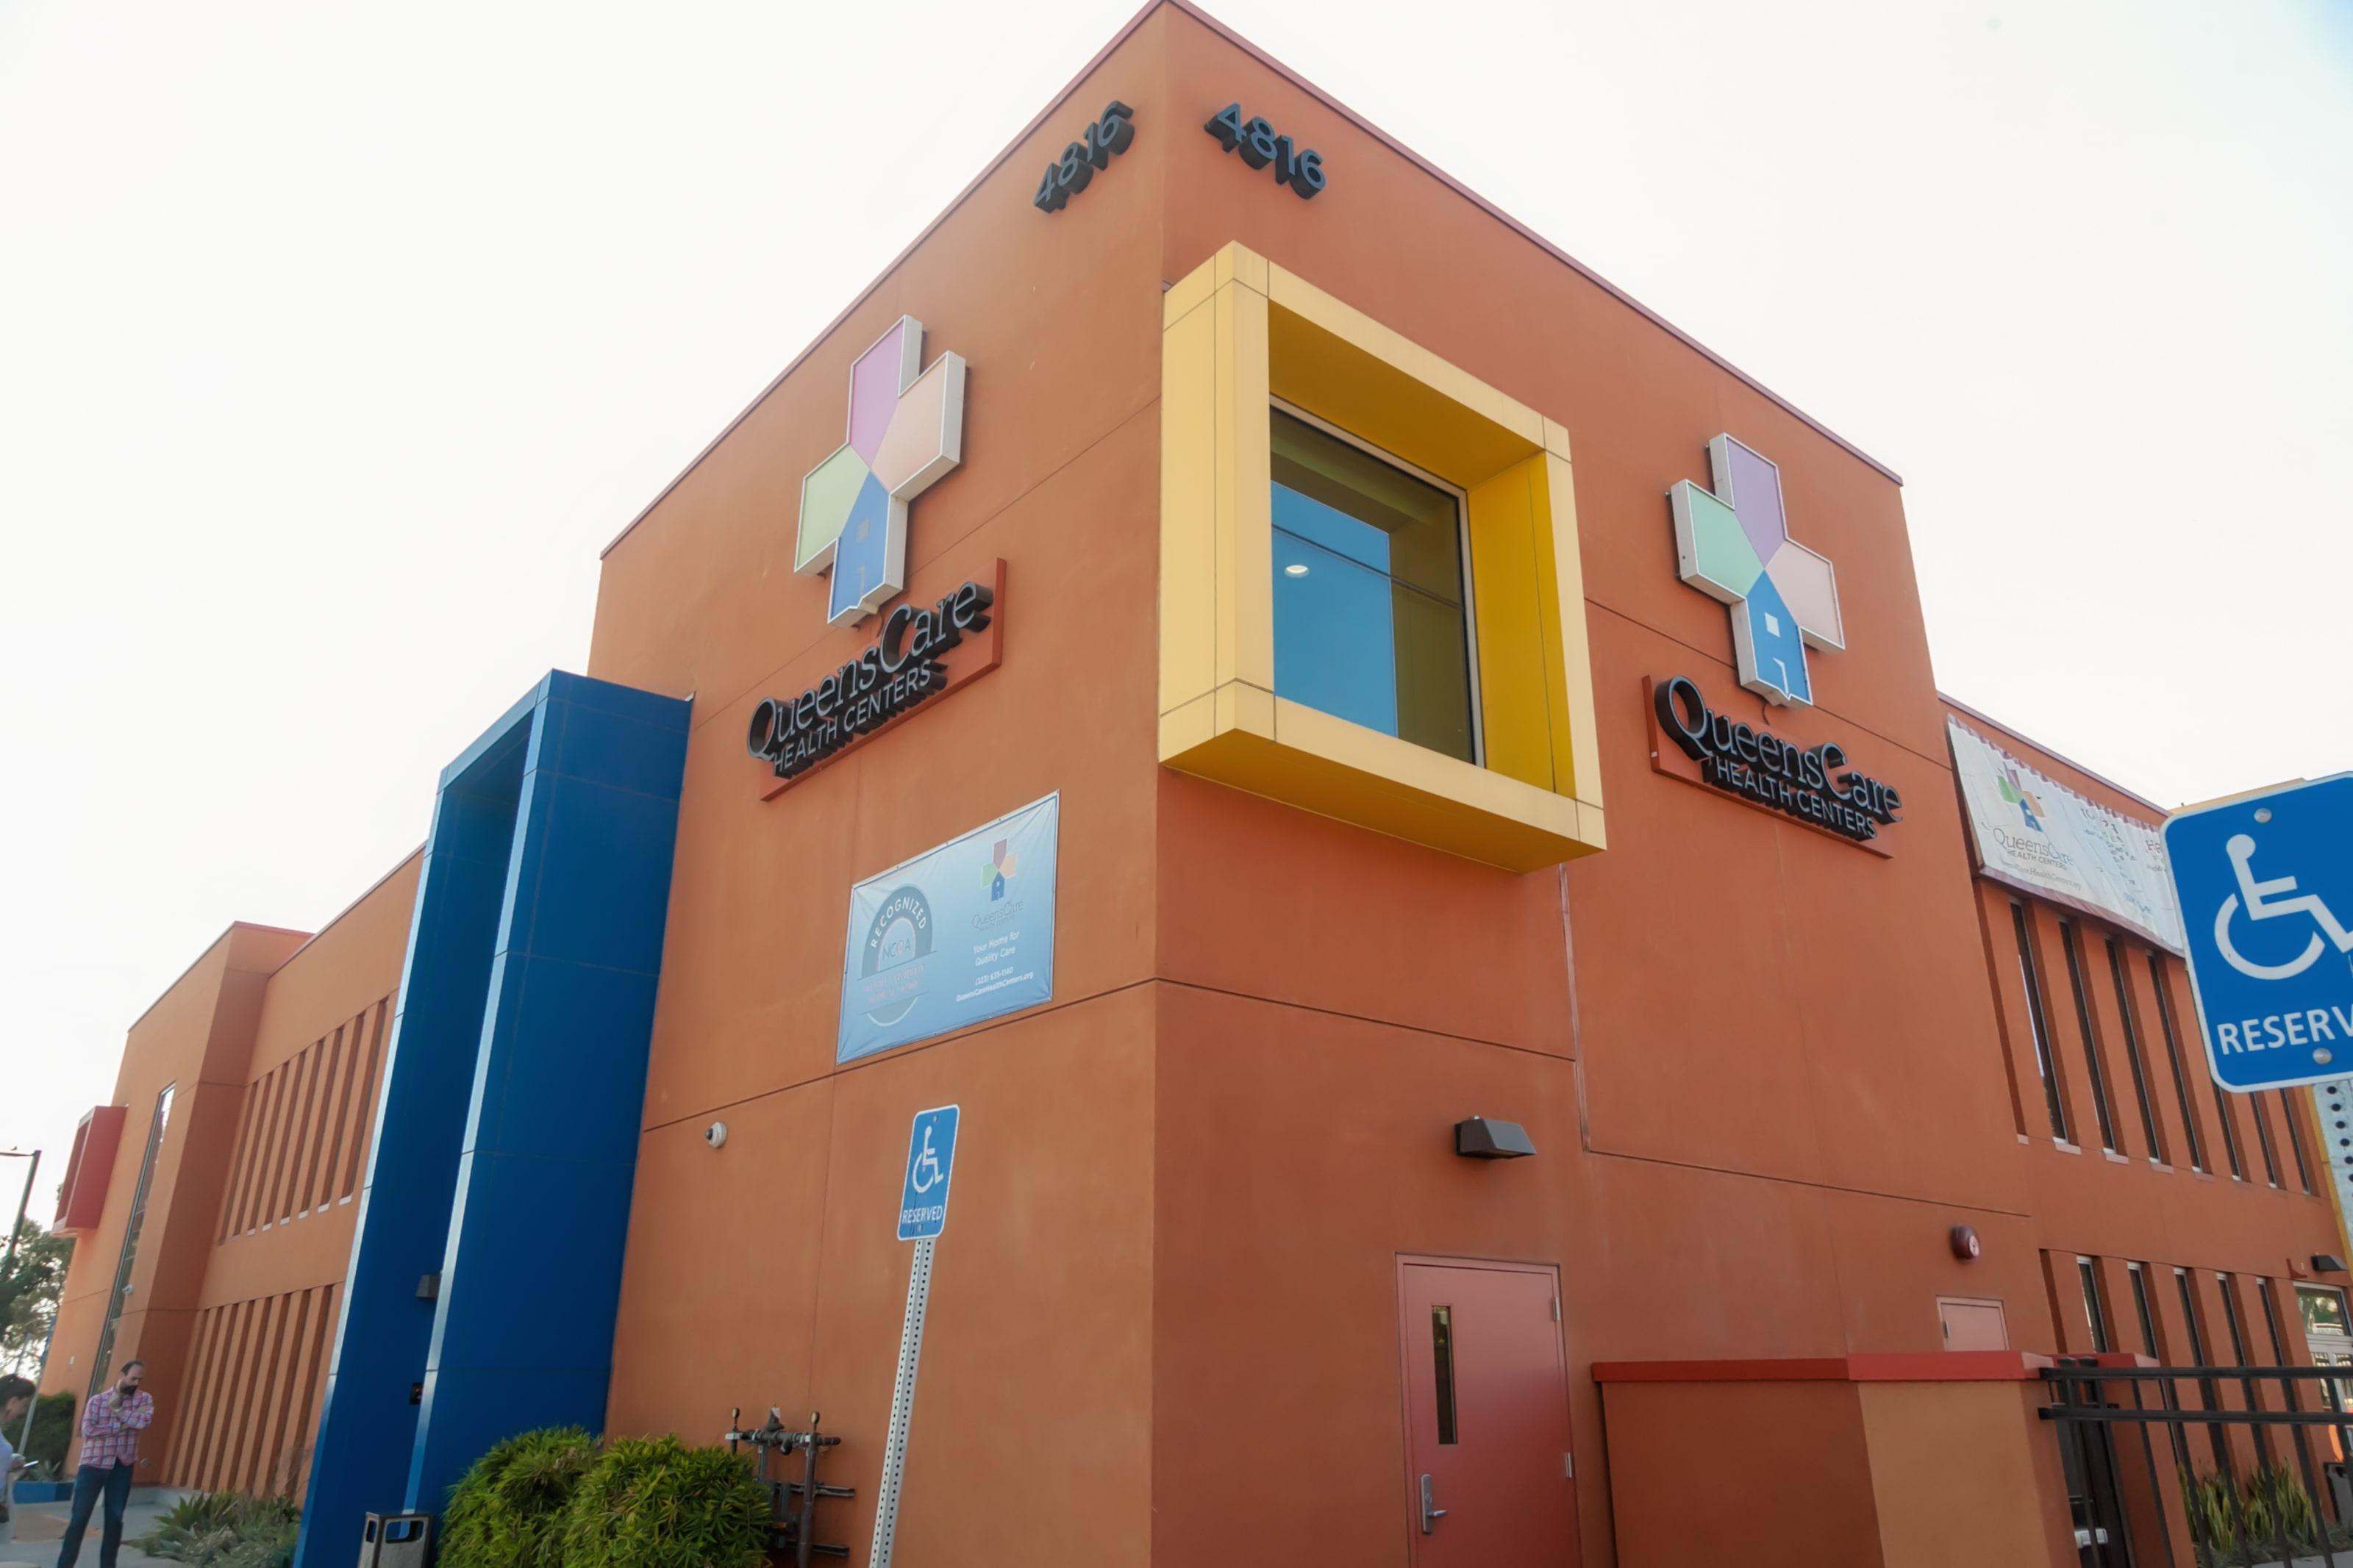 QueensCare Health Centers - 3rd Street